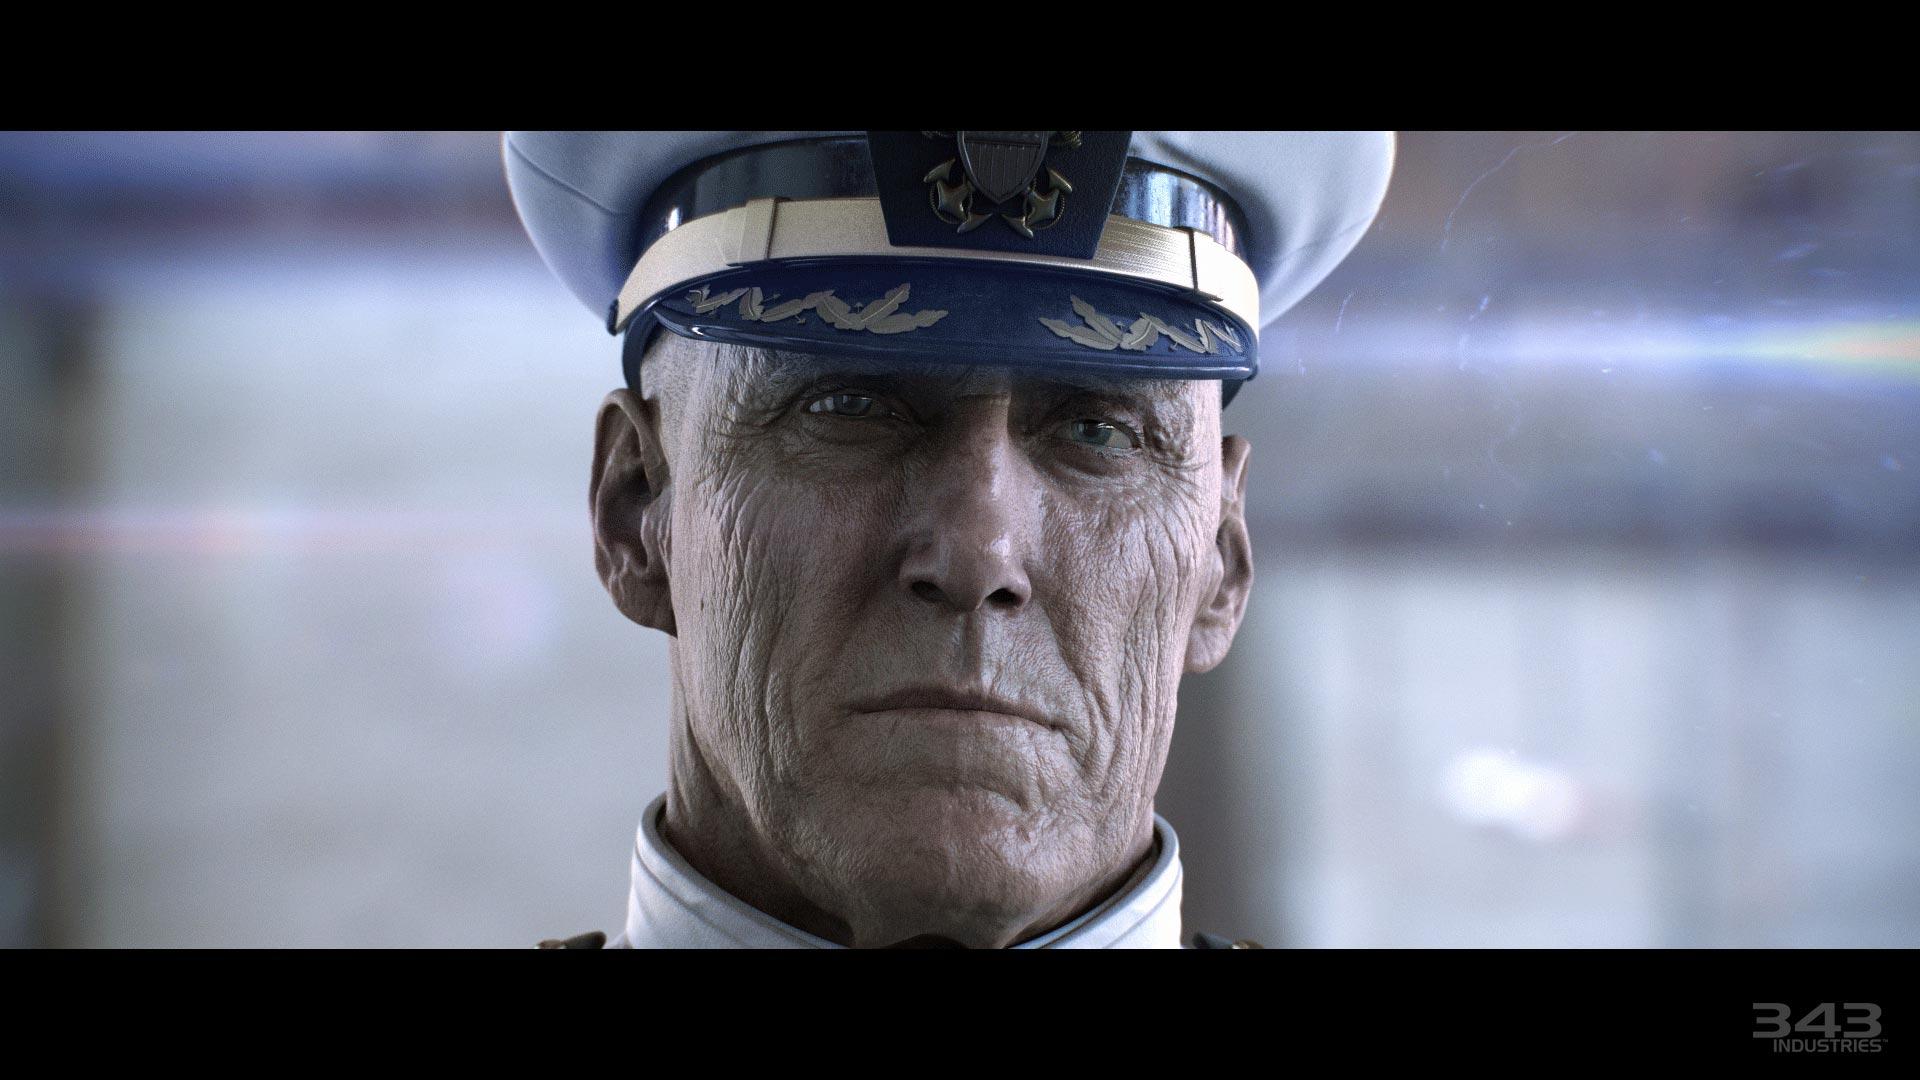 Halo 5: Guardians information dump! E3-2014-halo-2-anniversary-cinematic-lord-hood